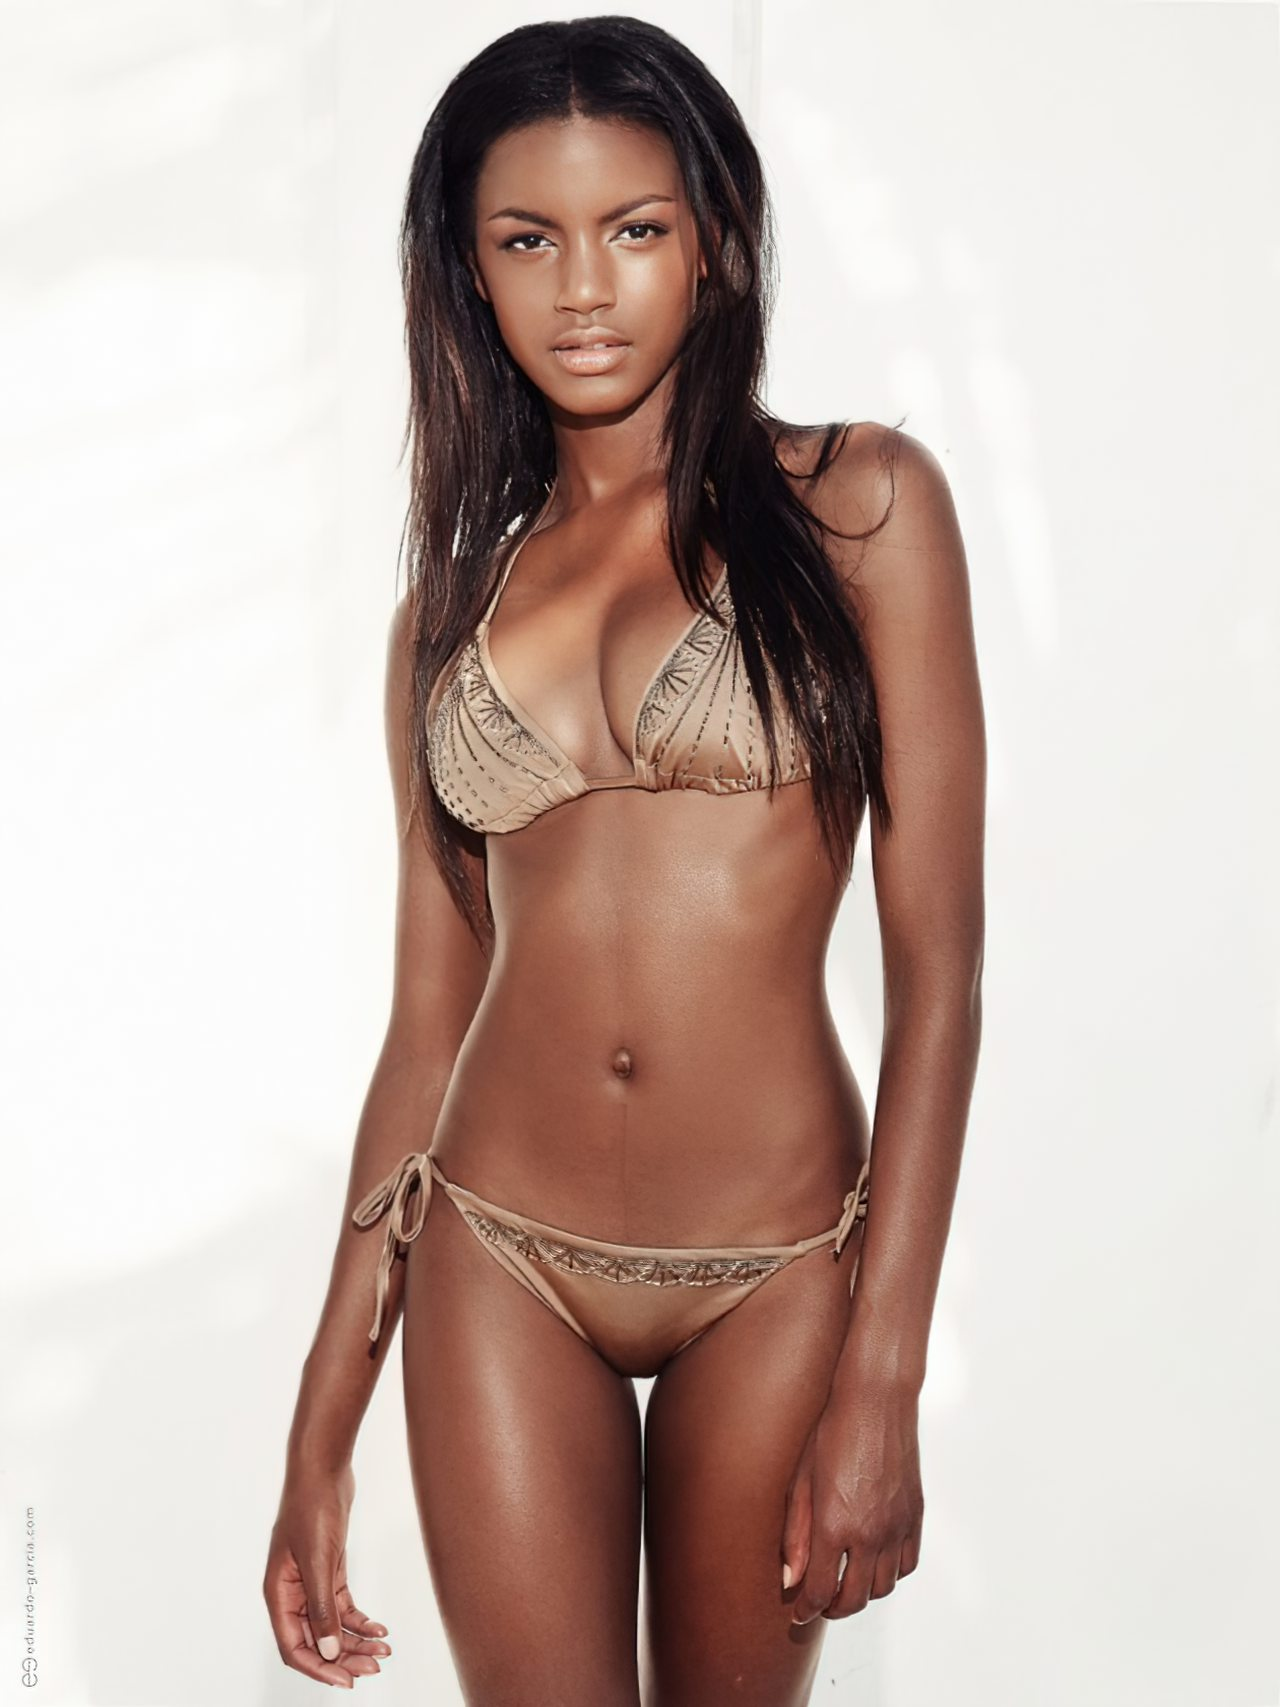 Mulheres Negras Bonitas (53)